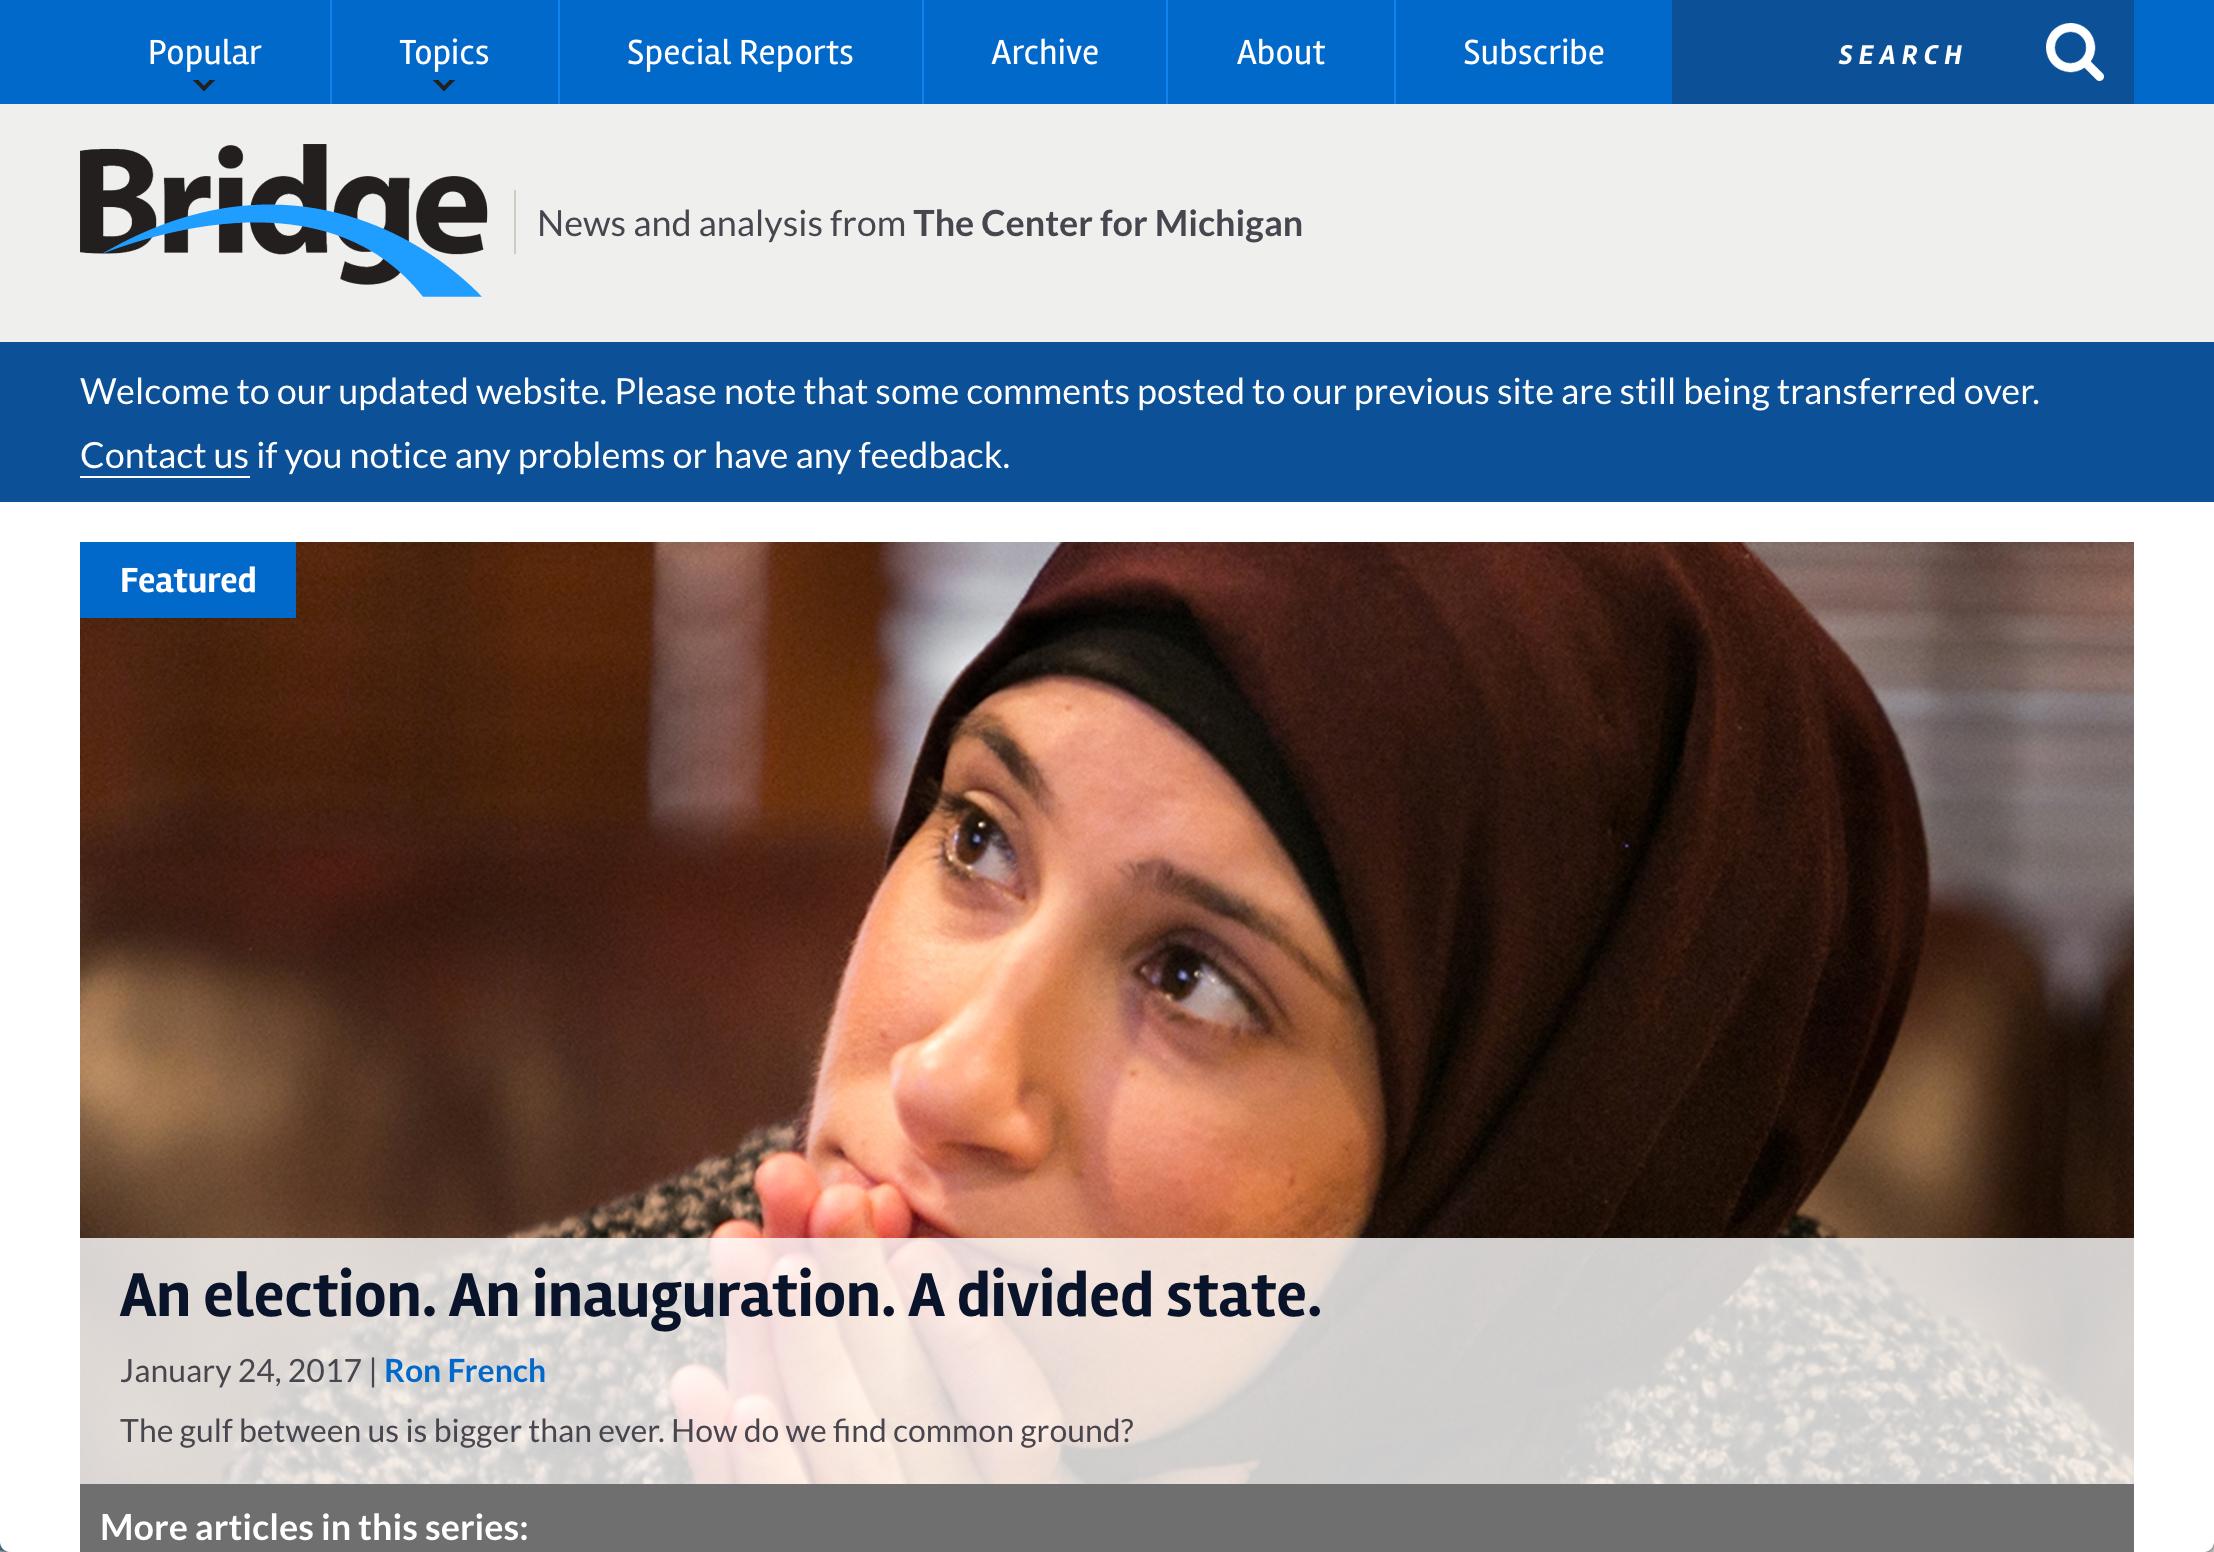 New Bridge website design